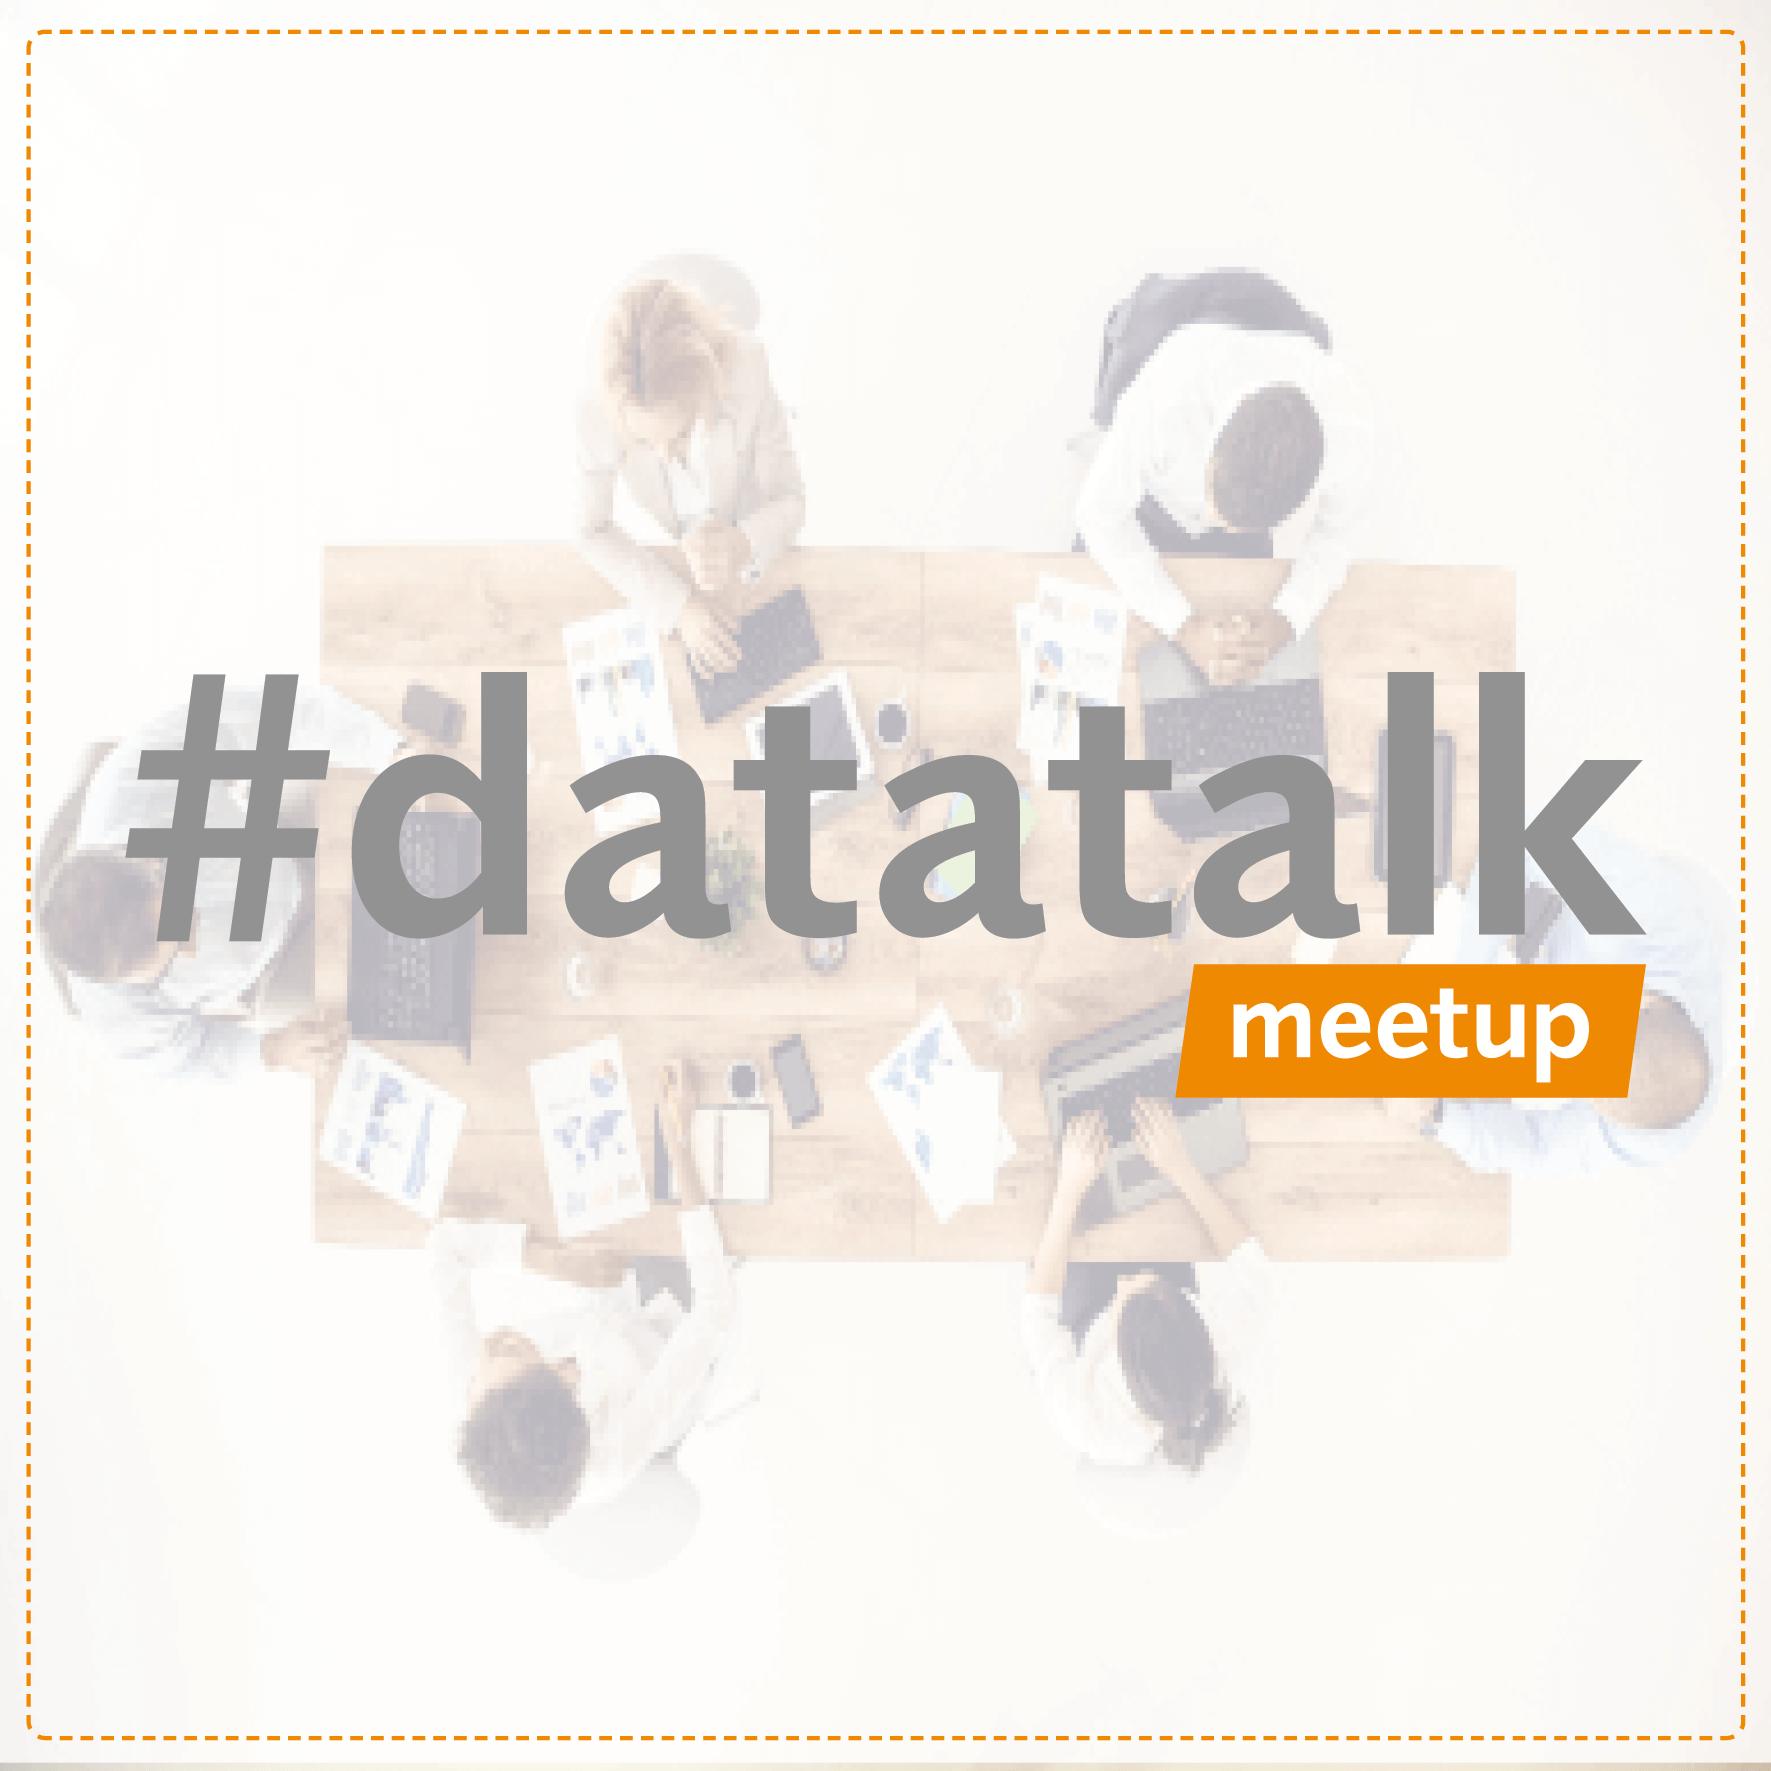 #datatalk meetup